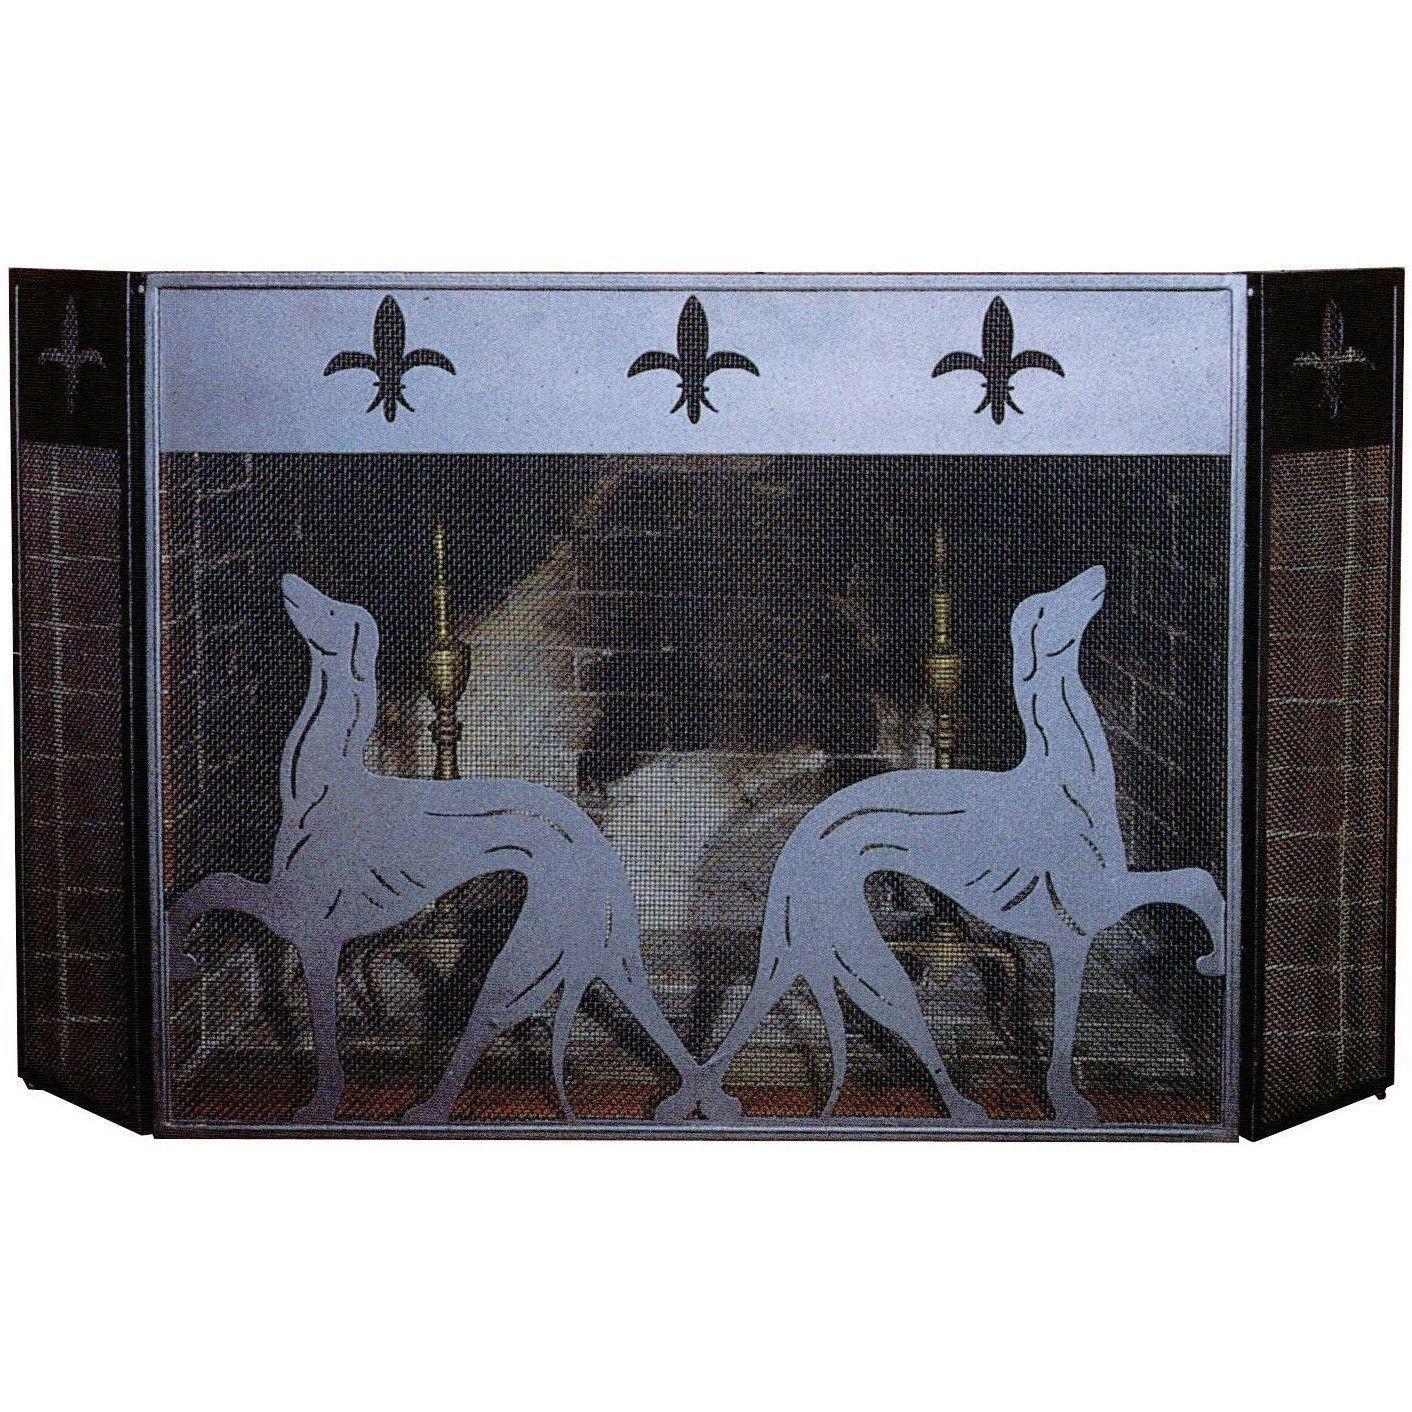 50 Inch W X 30 Inch H Greyhound Folding Fireplace Screen